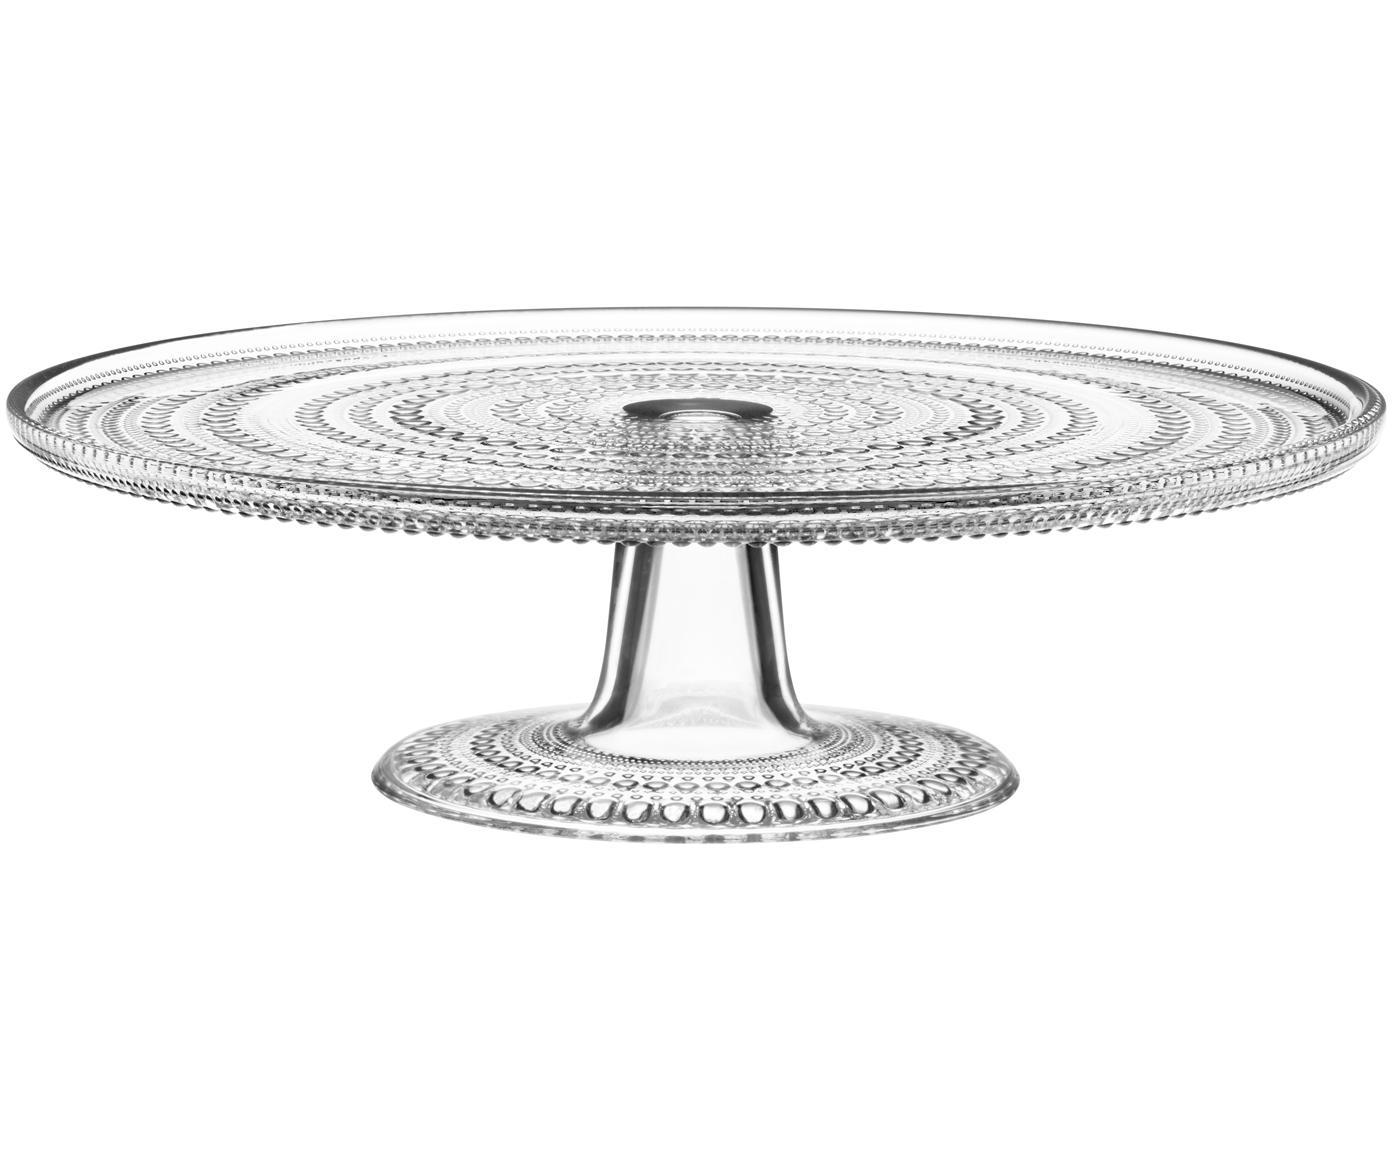 Patera na tort Kastehelmi, Szkło, Transparentny, Ø 32 cm